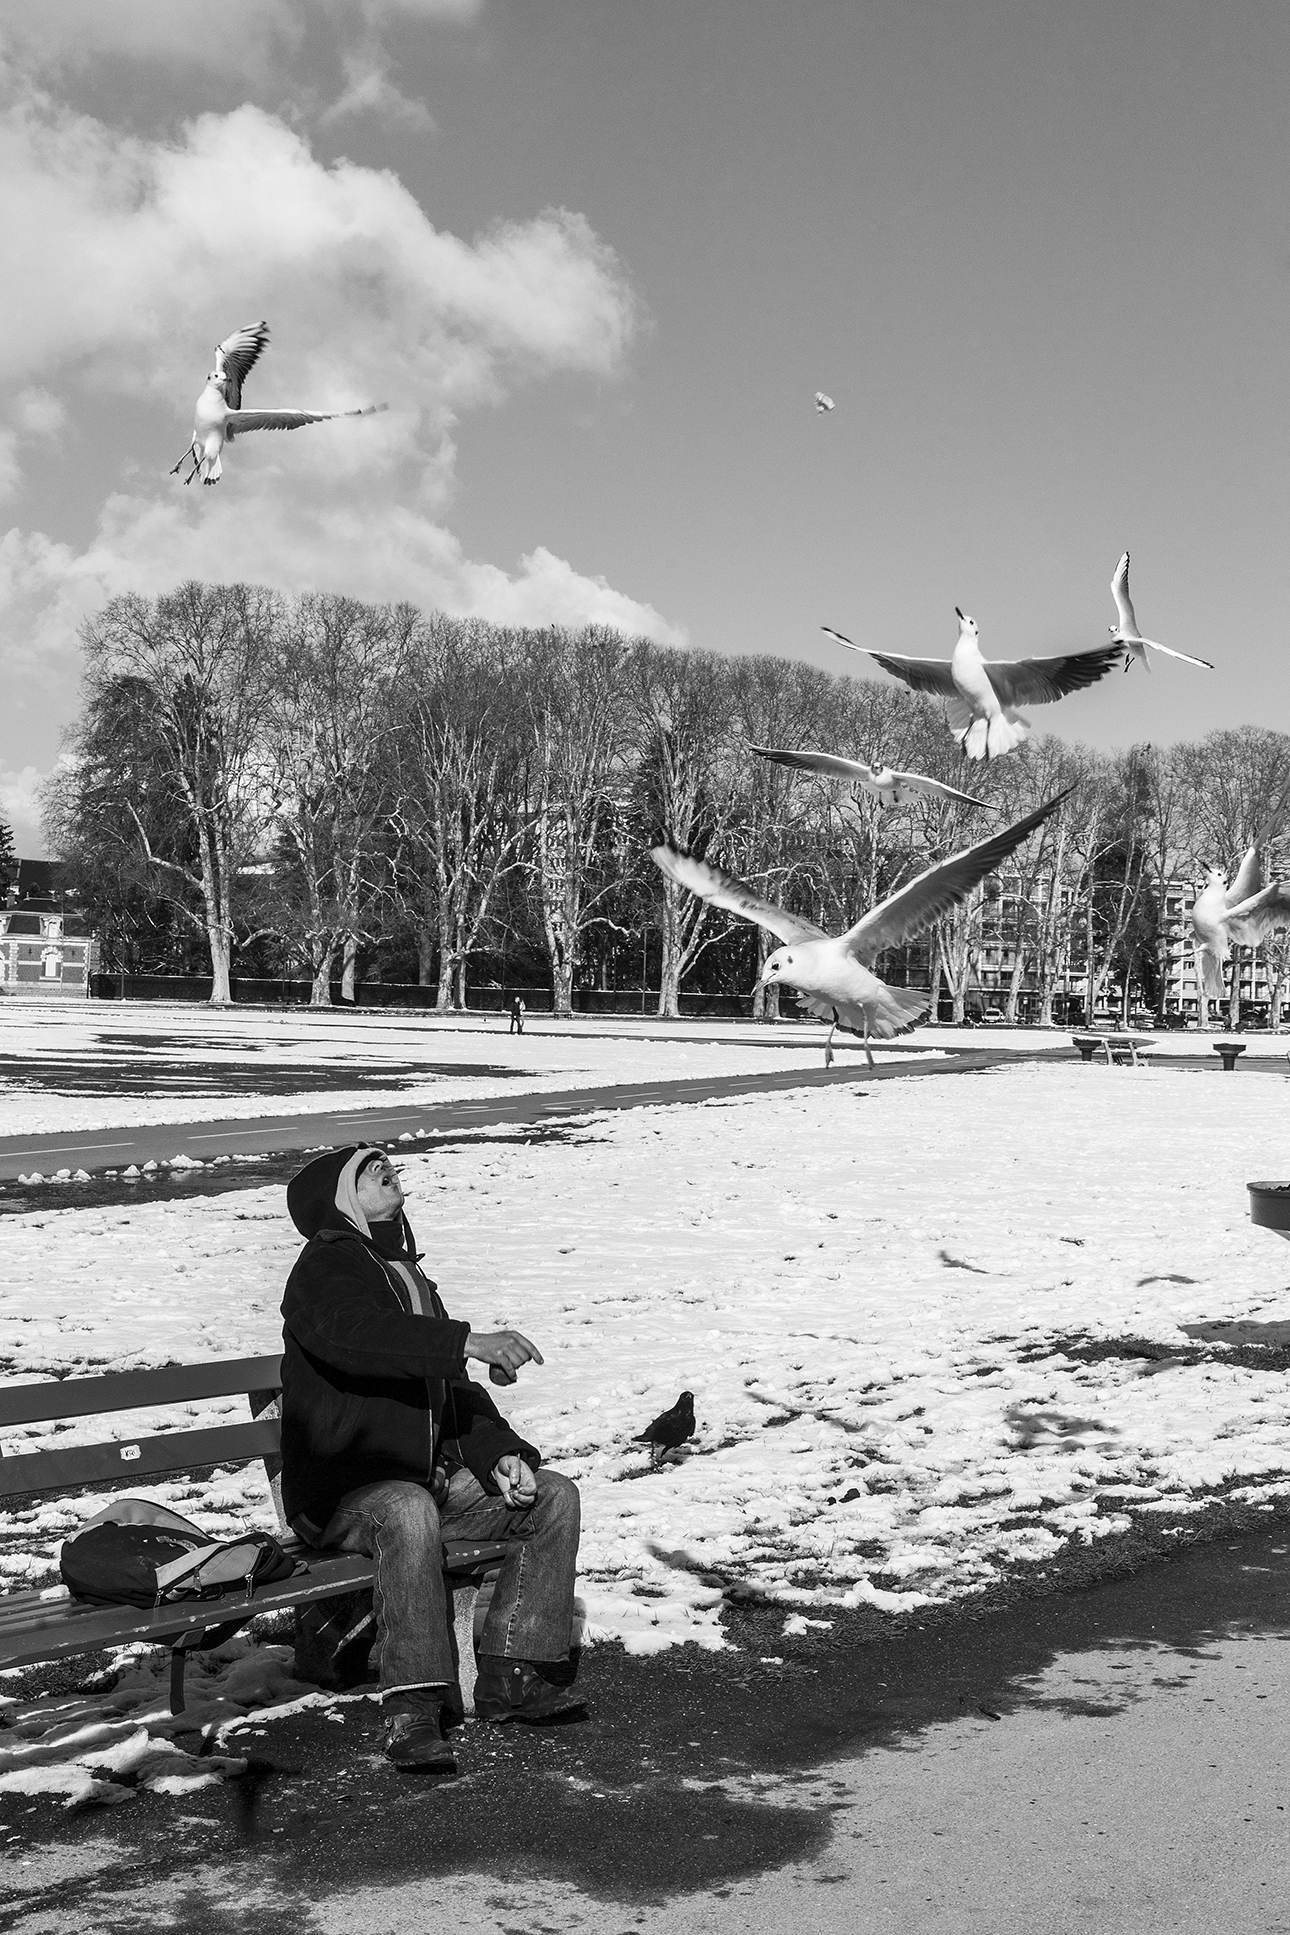 mouettes-Annecy-février-2013.jpg